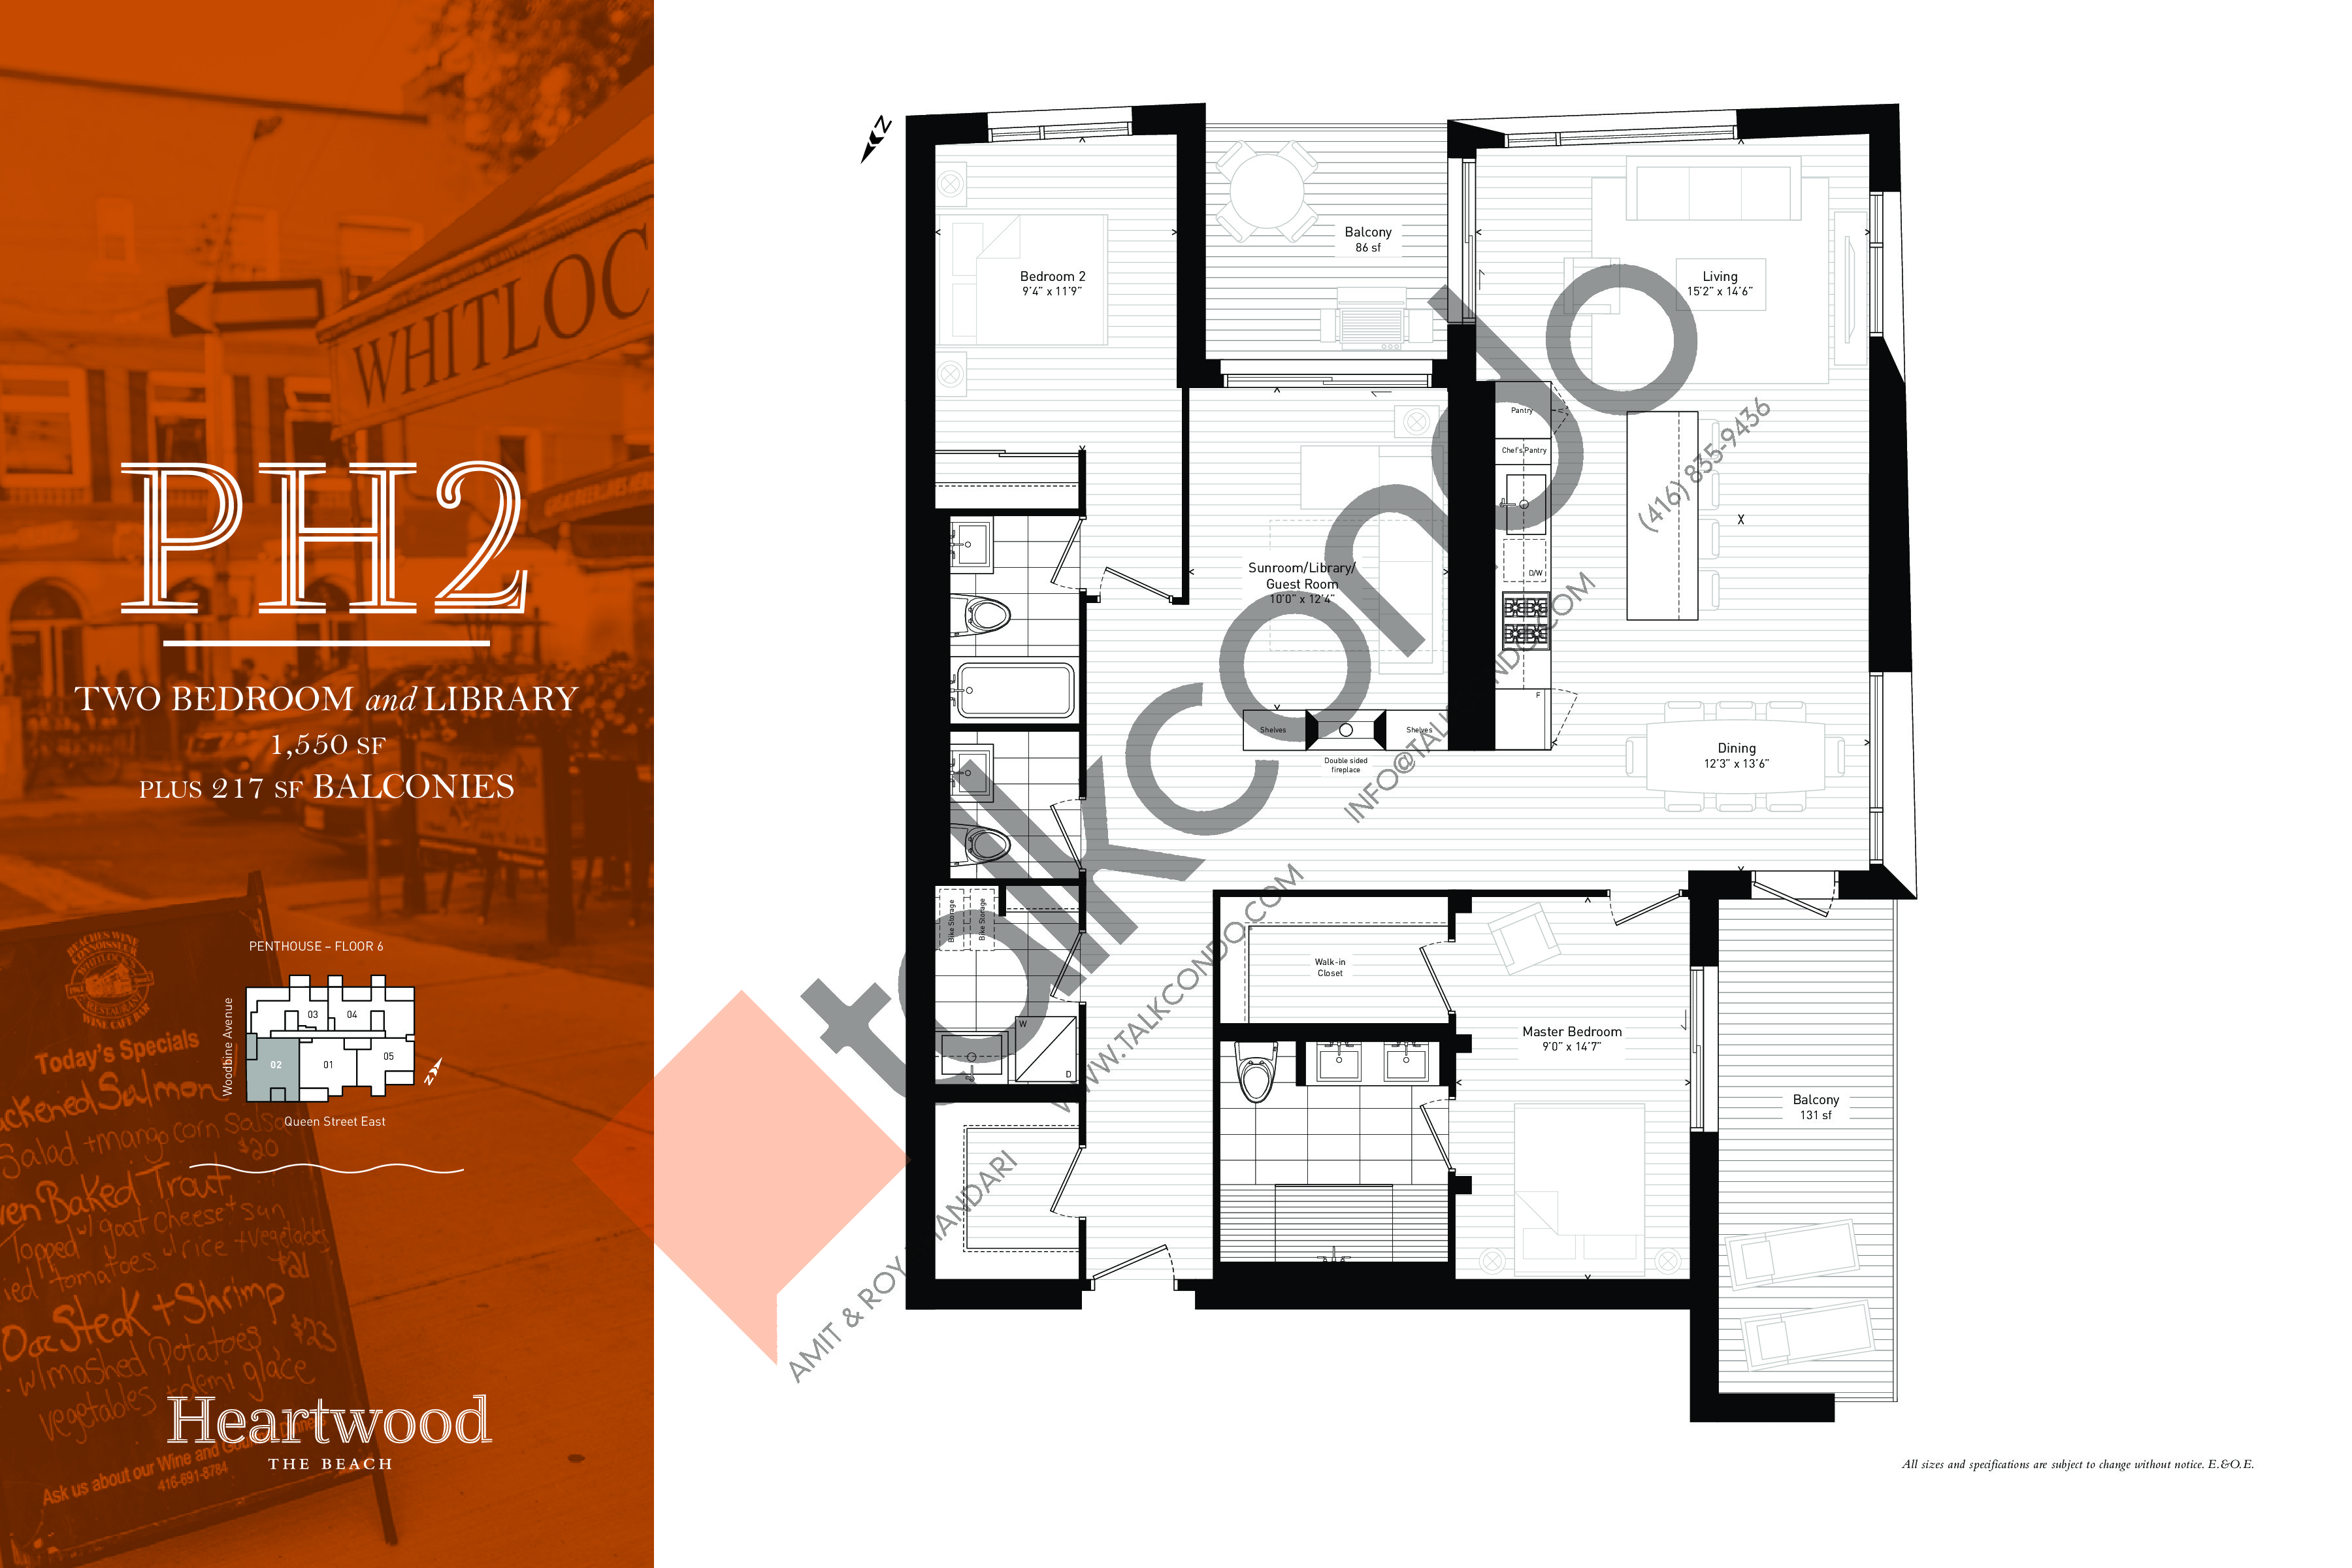 PH2 Floor Plan at Heartwood the Beach Condos - 1550 sq.ft